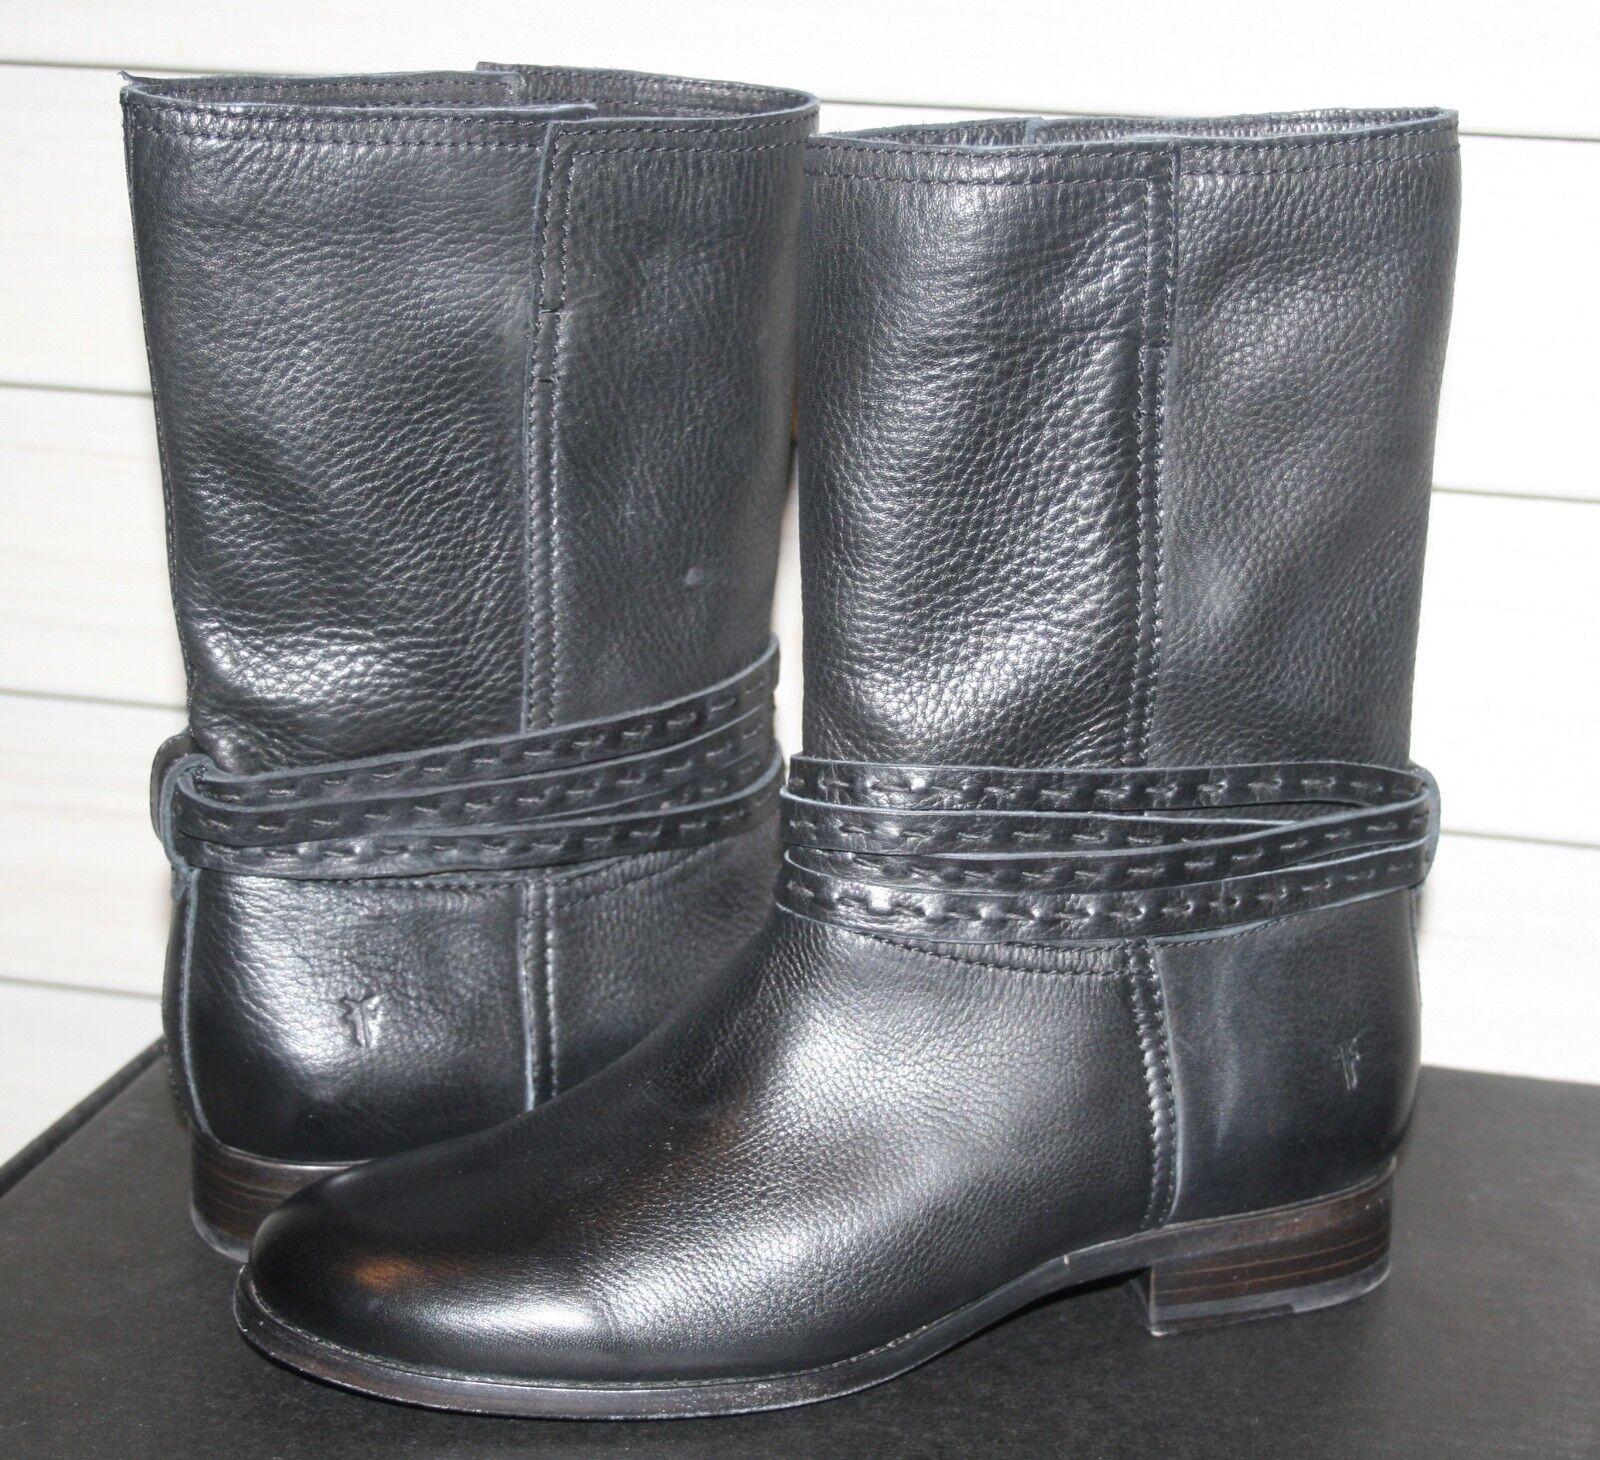 FRYE CARA PICKSTITCH MID US 9 Woman's Mid Calf Boot Back